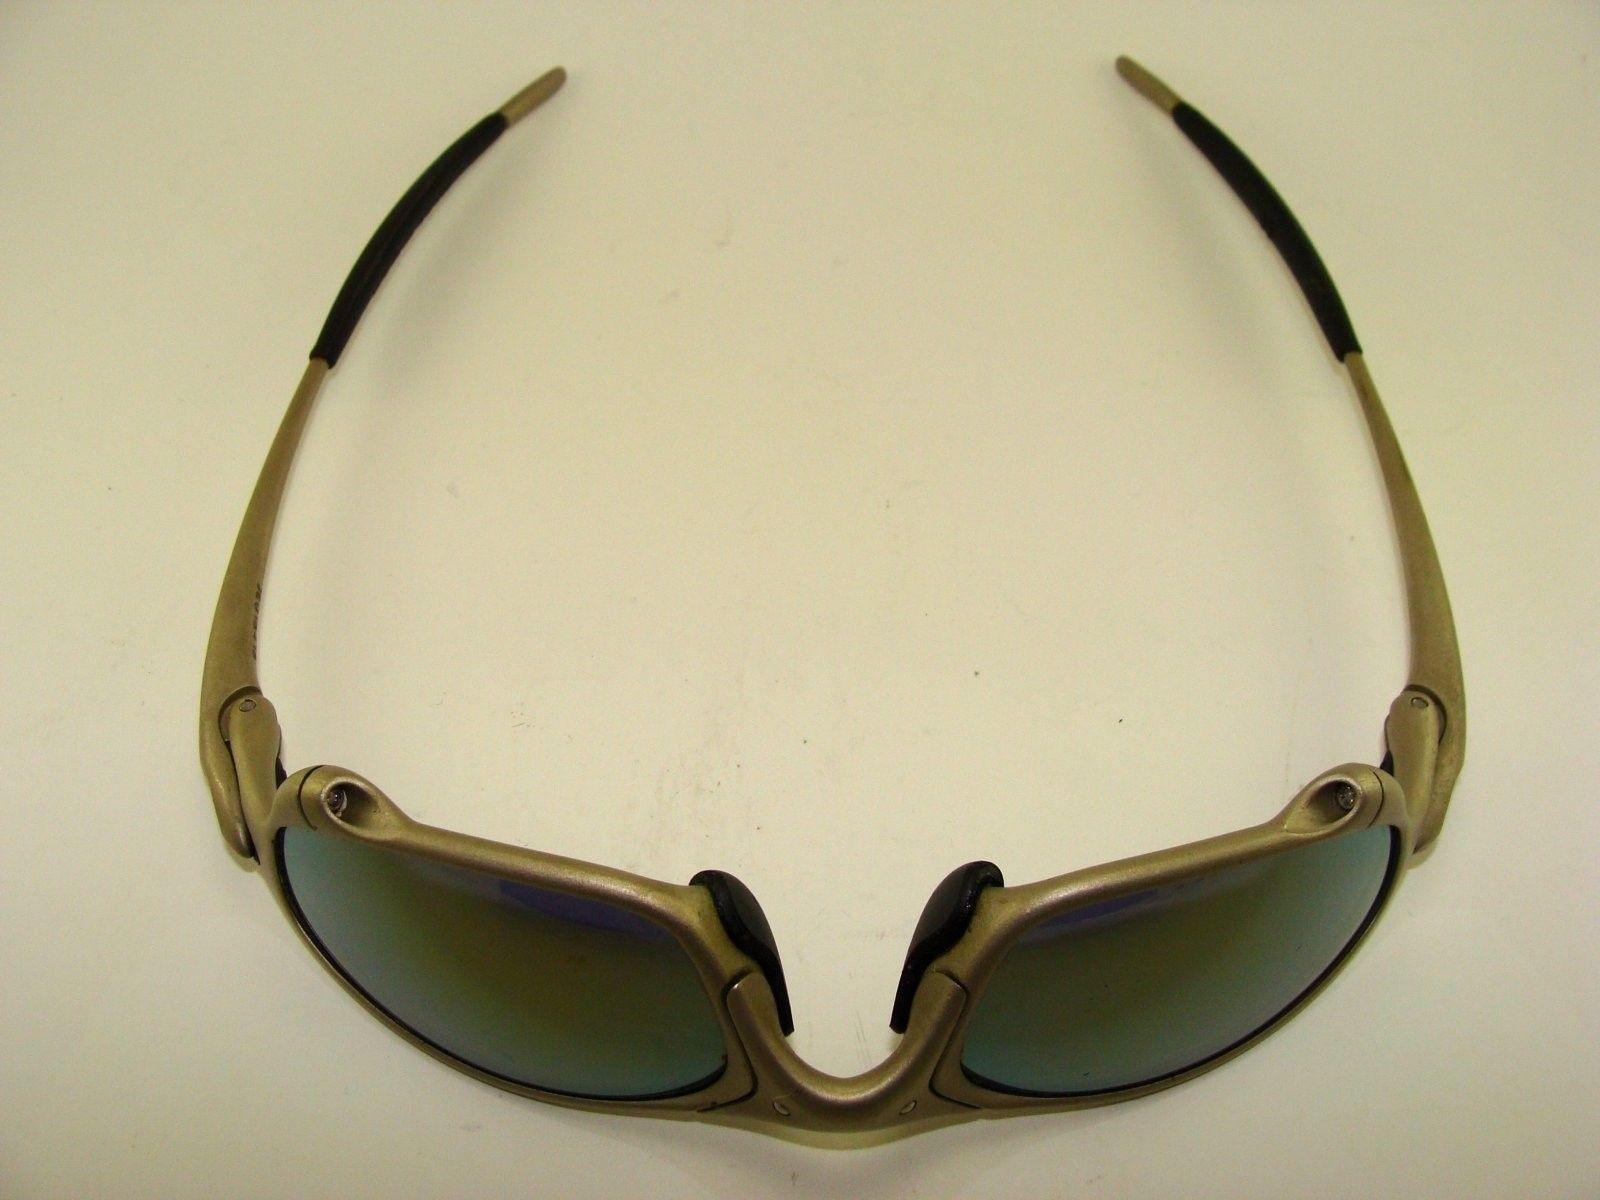 1st Gen Juliet Plasma Emerald 04-115 $400 Shipped CONUS - Oakley Emerald Juliet08.jpg